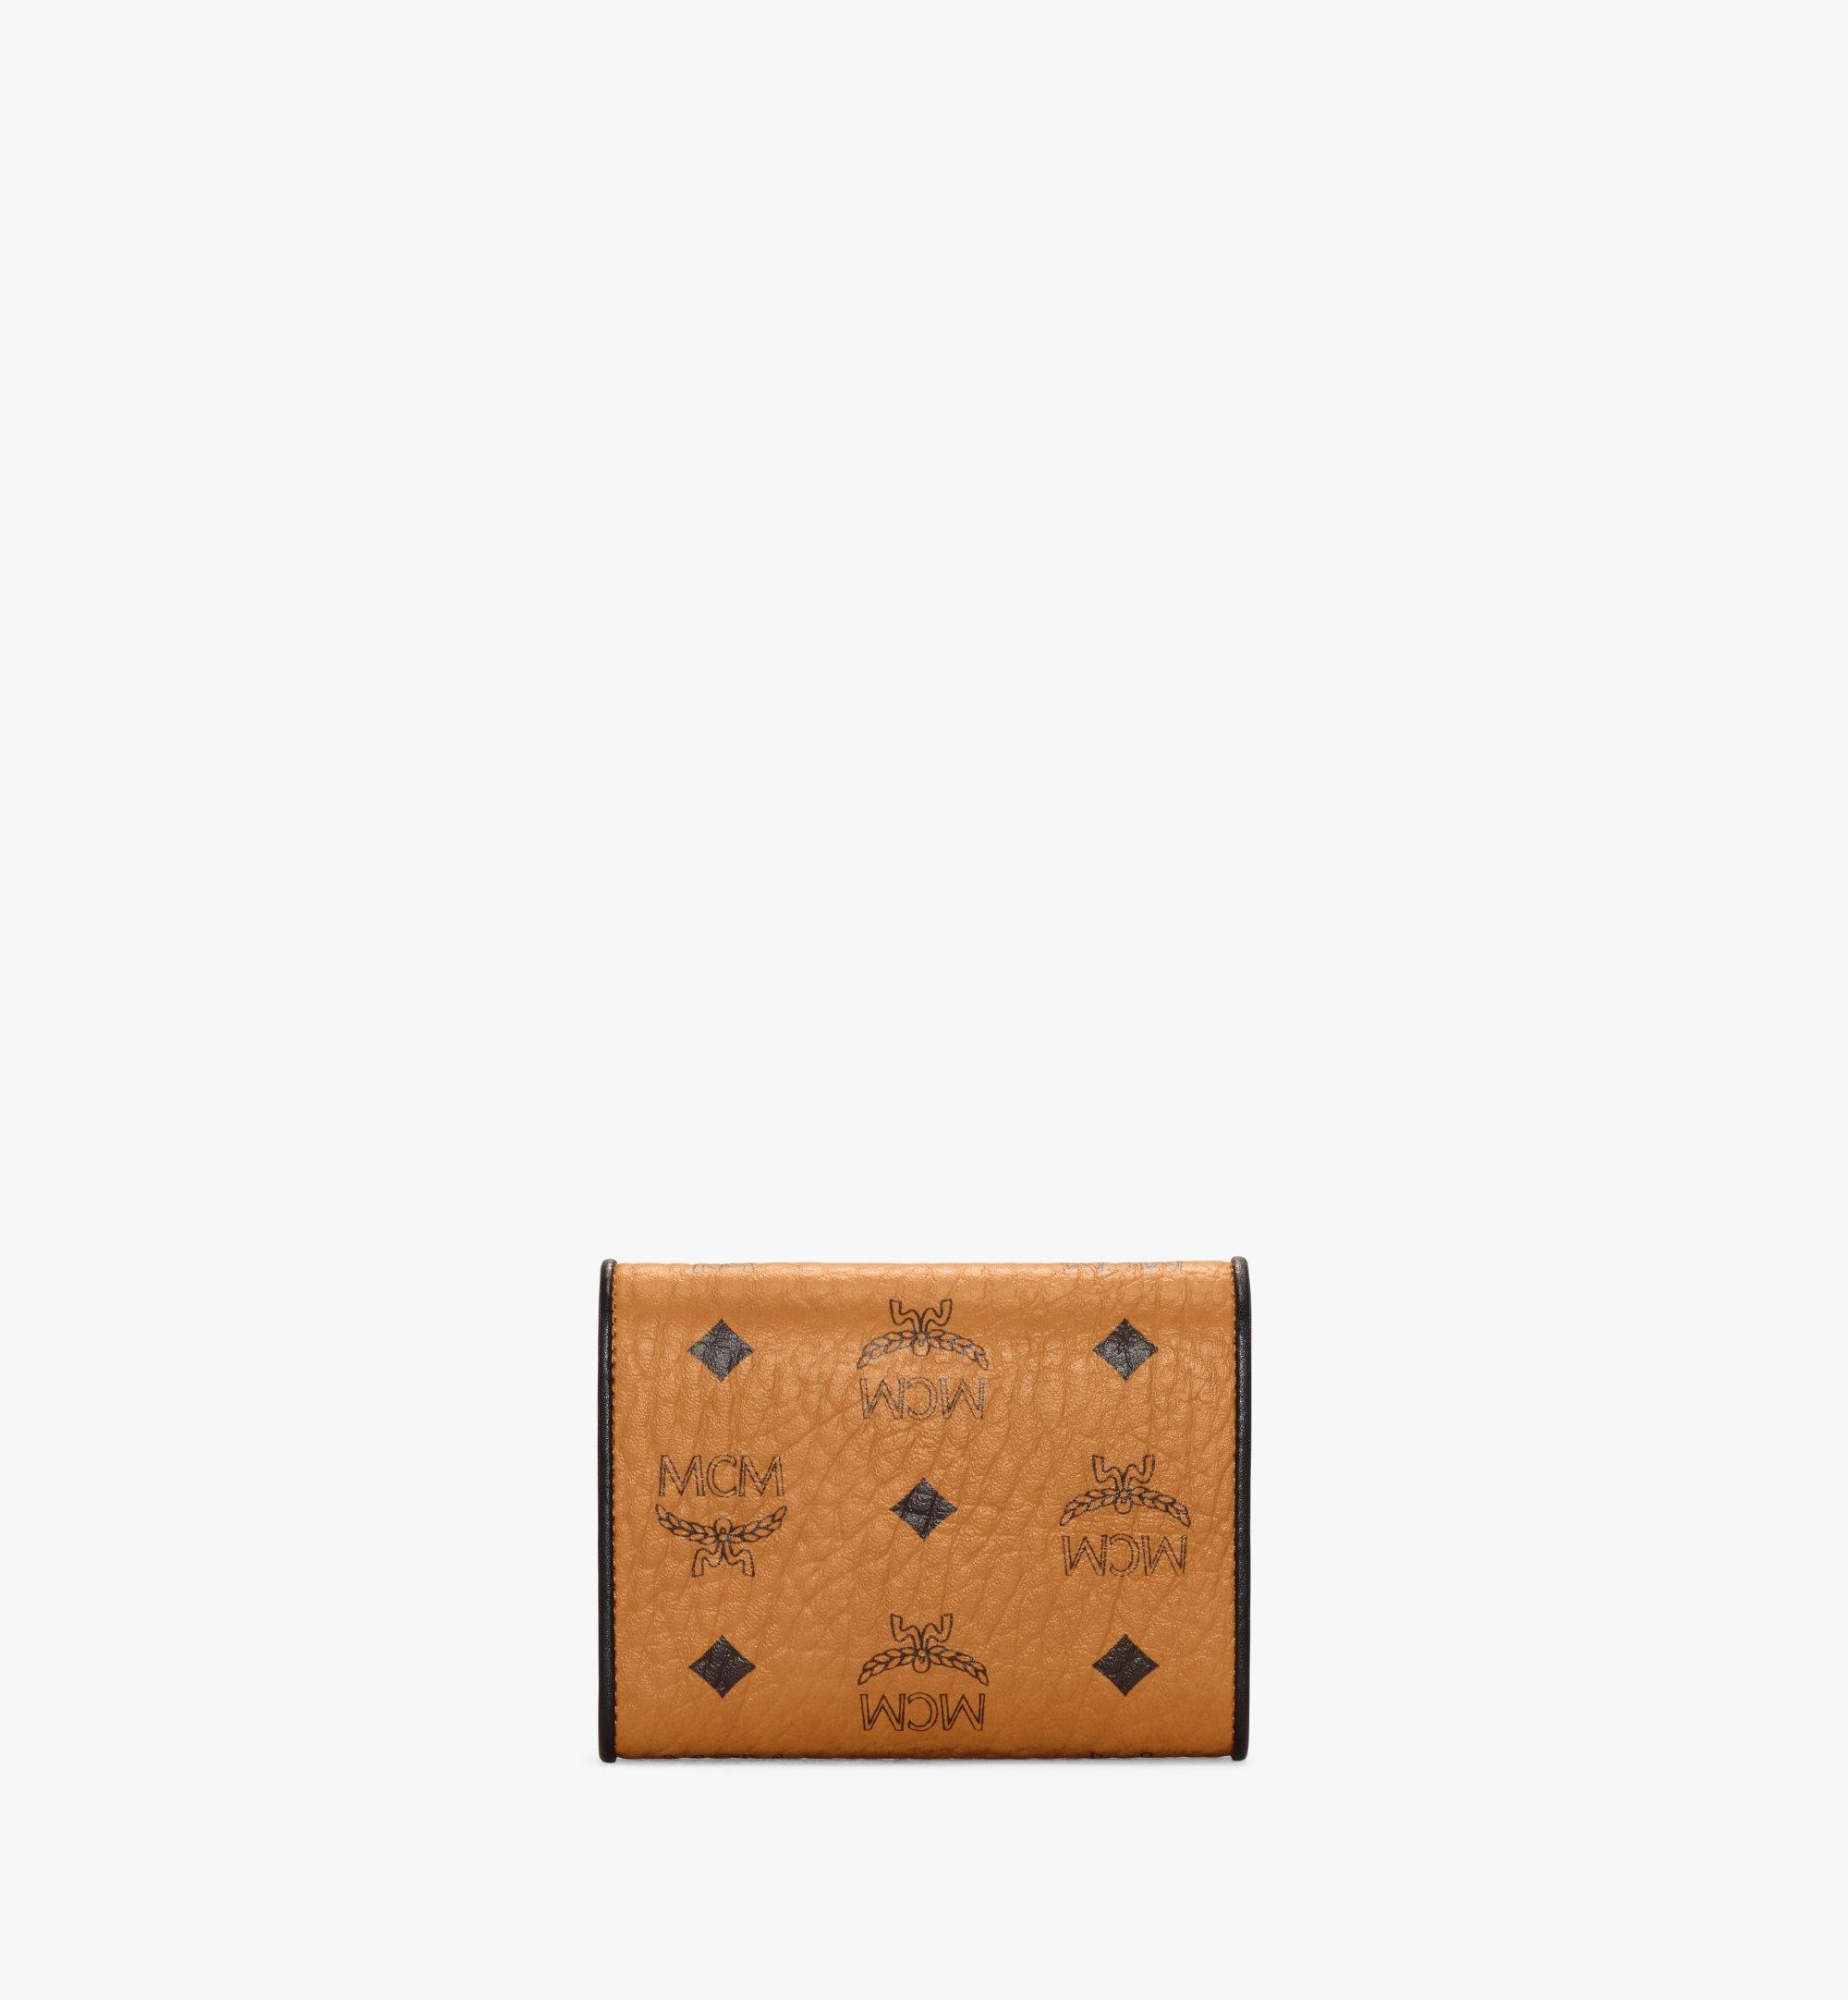 MCM 拼色 Visetos 皮革 Patricia 三折錢包 Cognac MYSAAPA05CO001 更多視圖 2